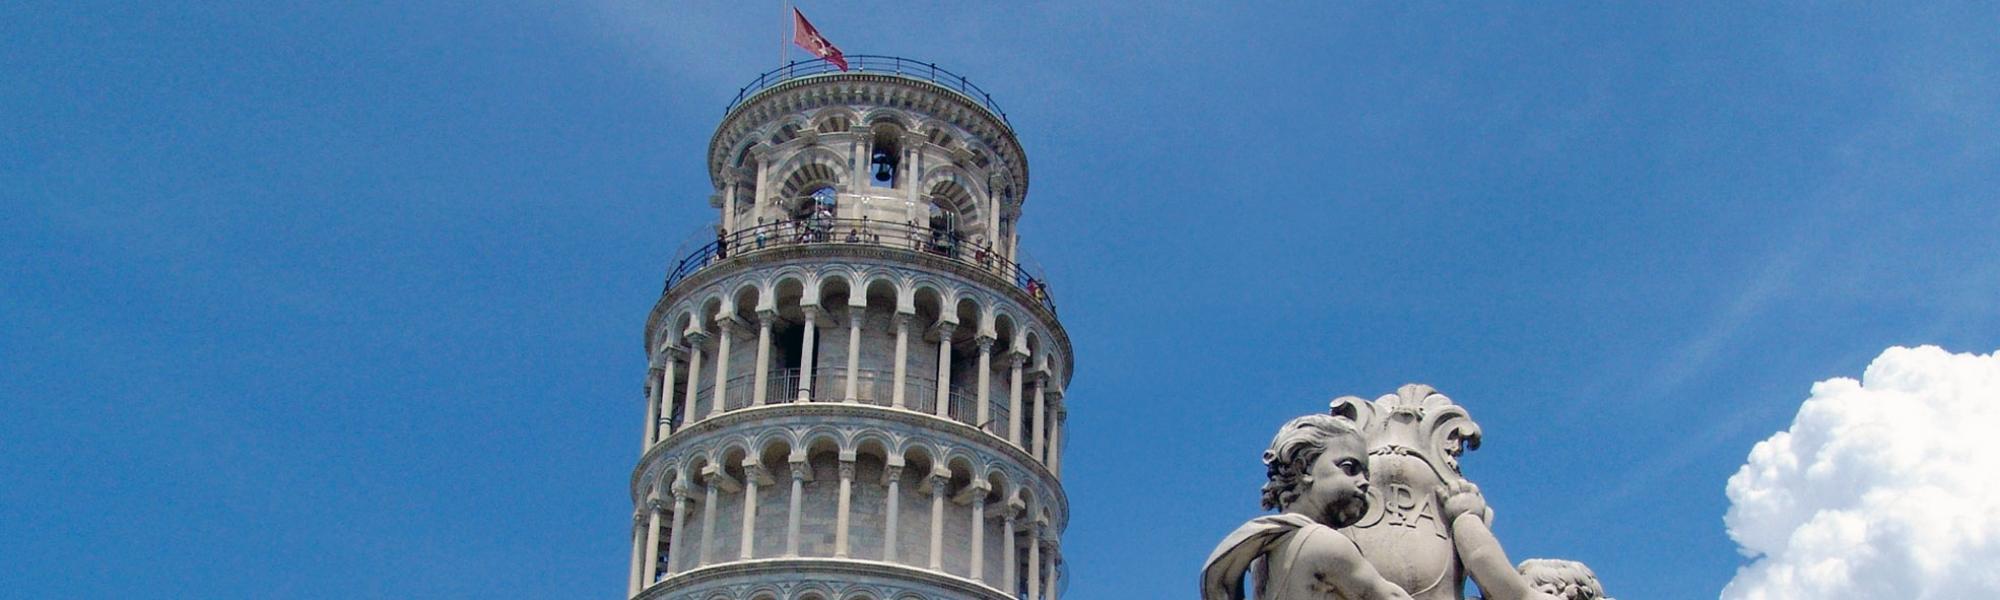 Torre campanaria (torre pendente)